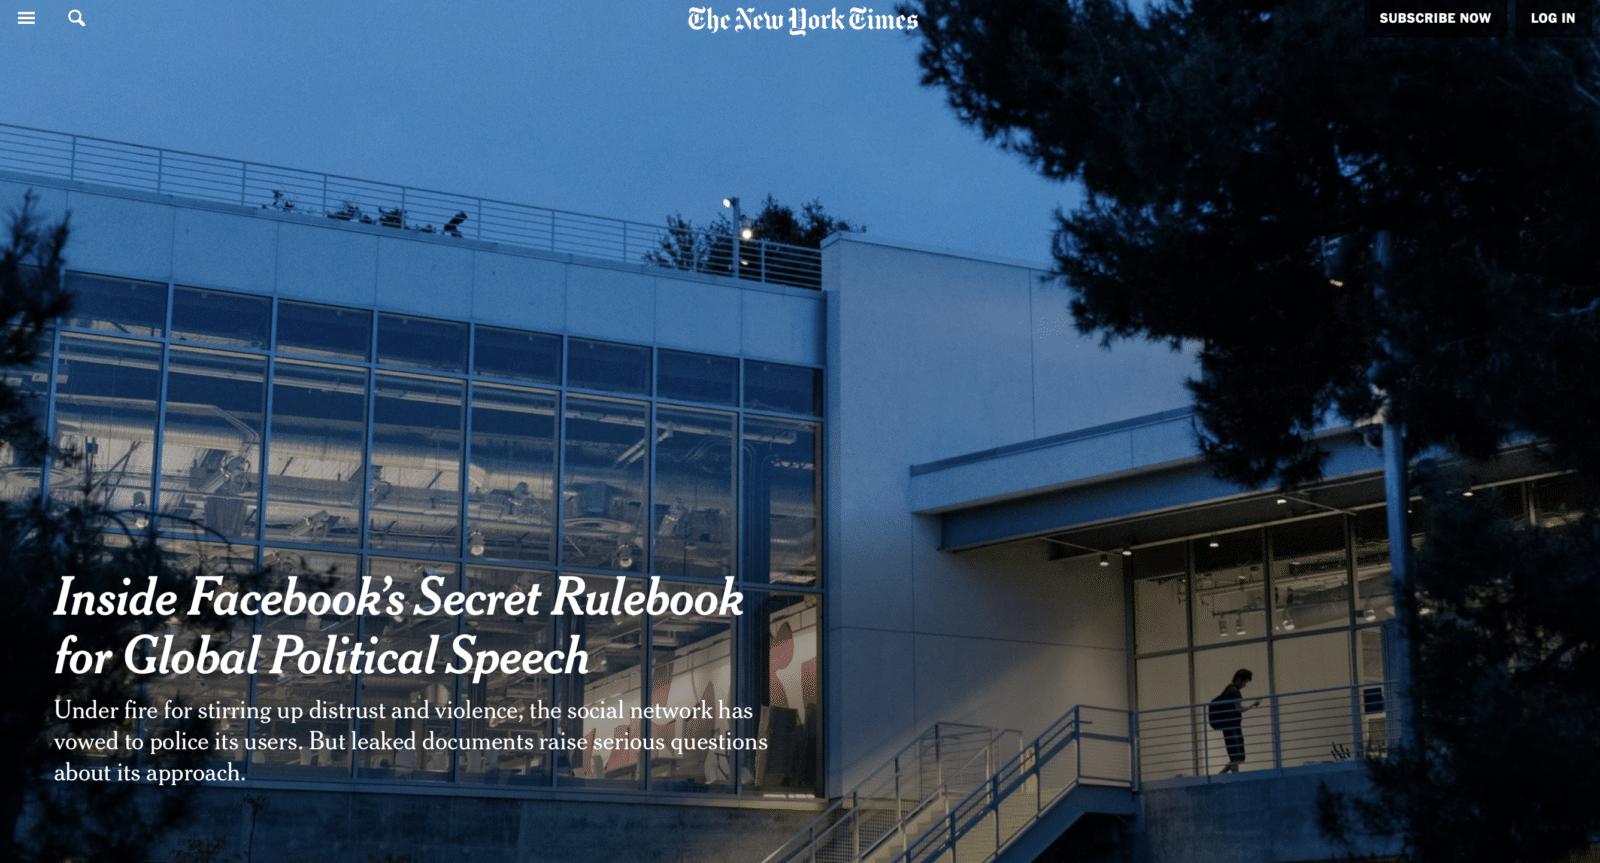 Facebook ออกมาโต้ หลัง New York Times บอกระบบกรอง Hate Speech ไร้คุณภาพ